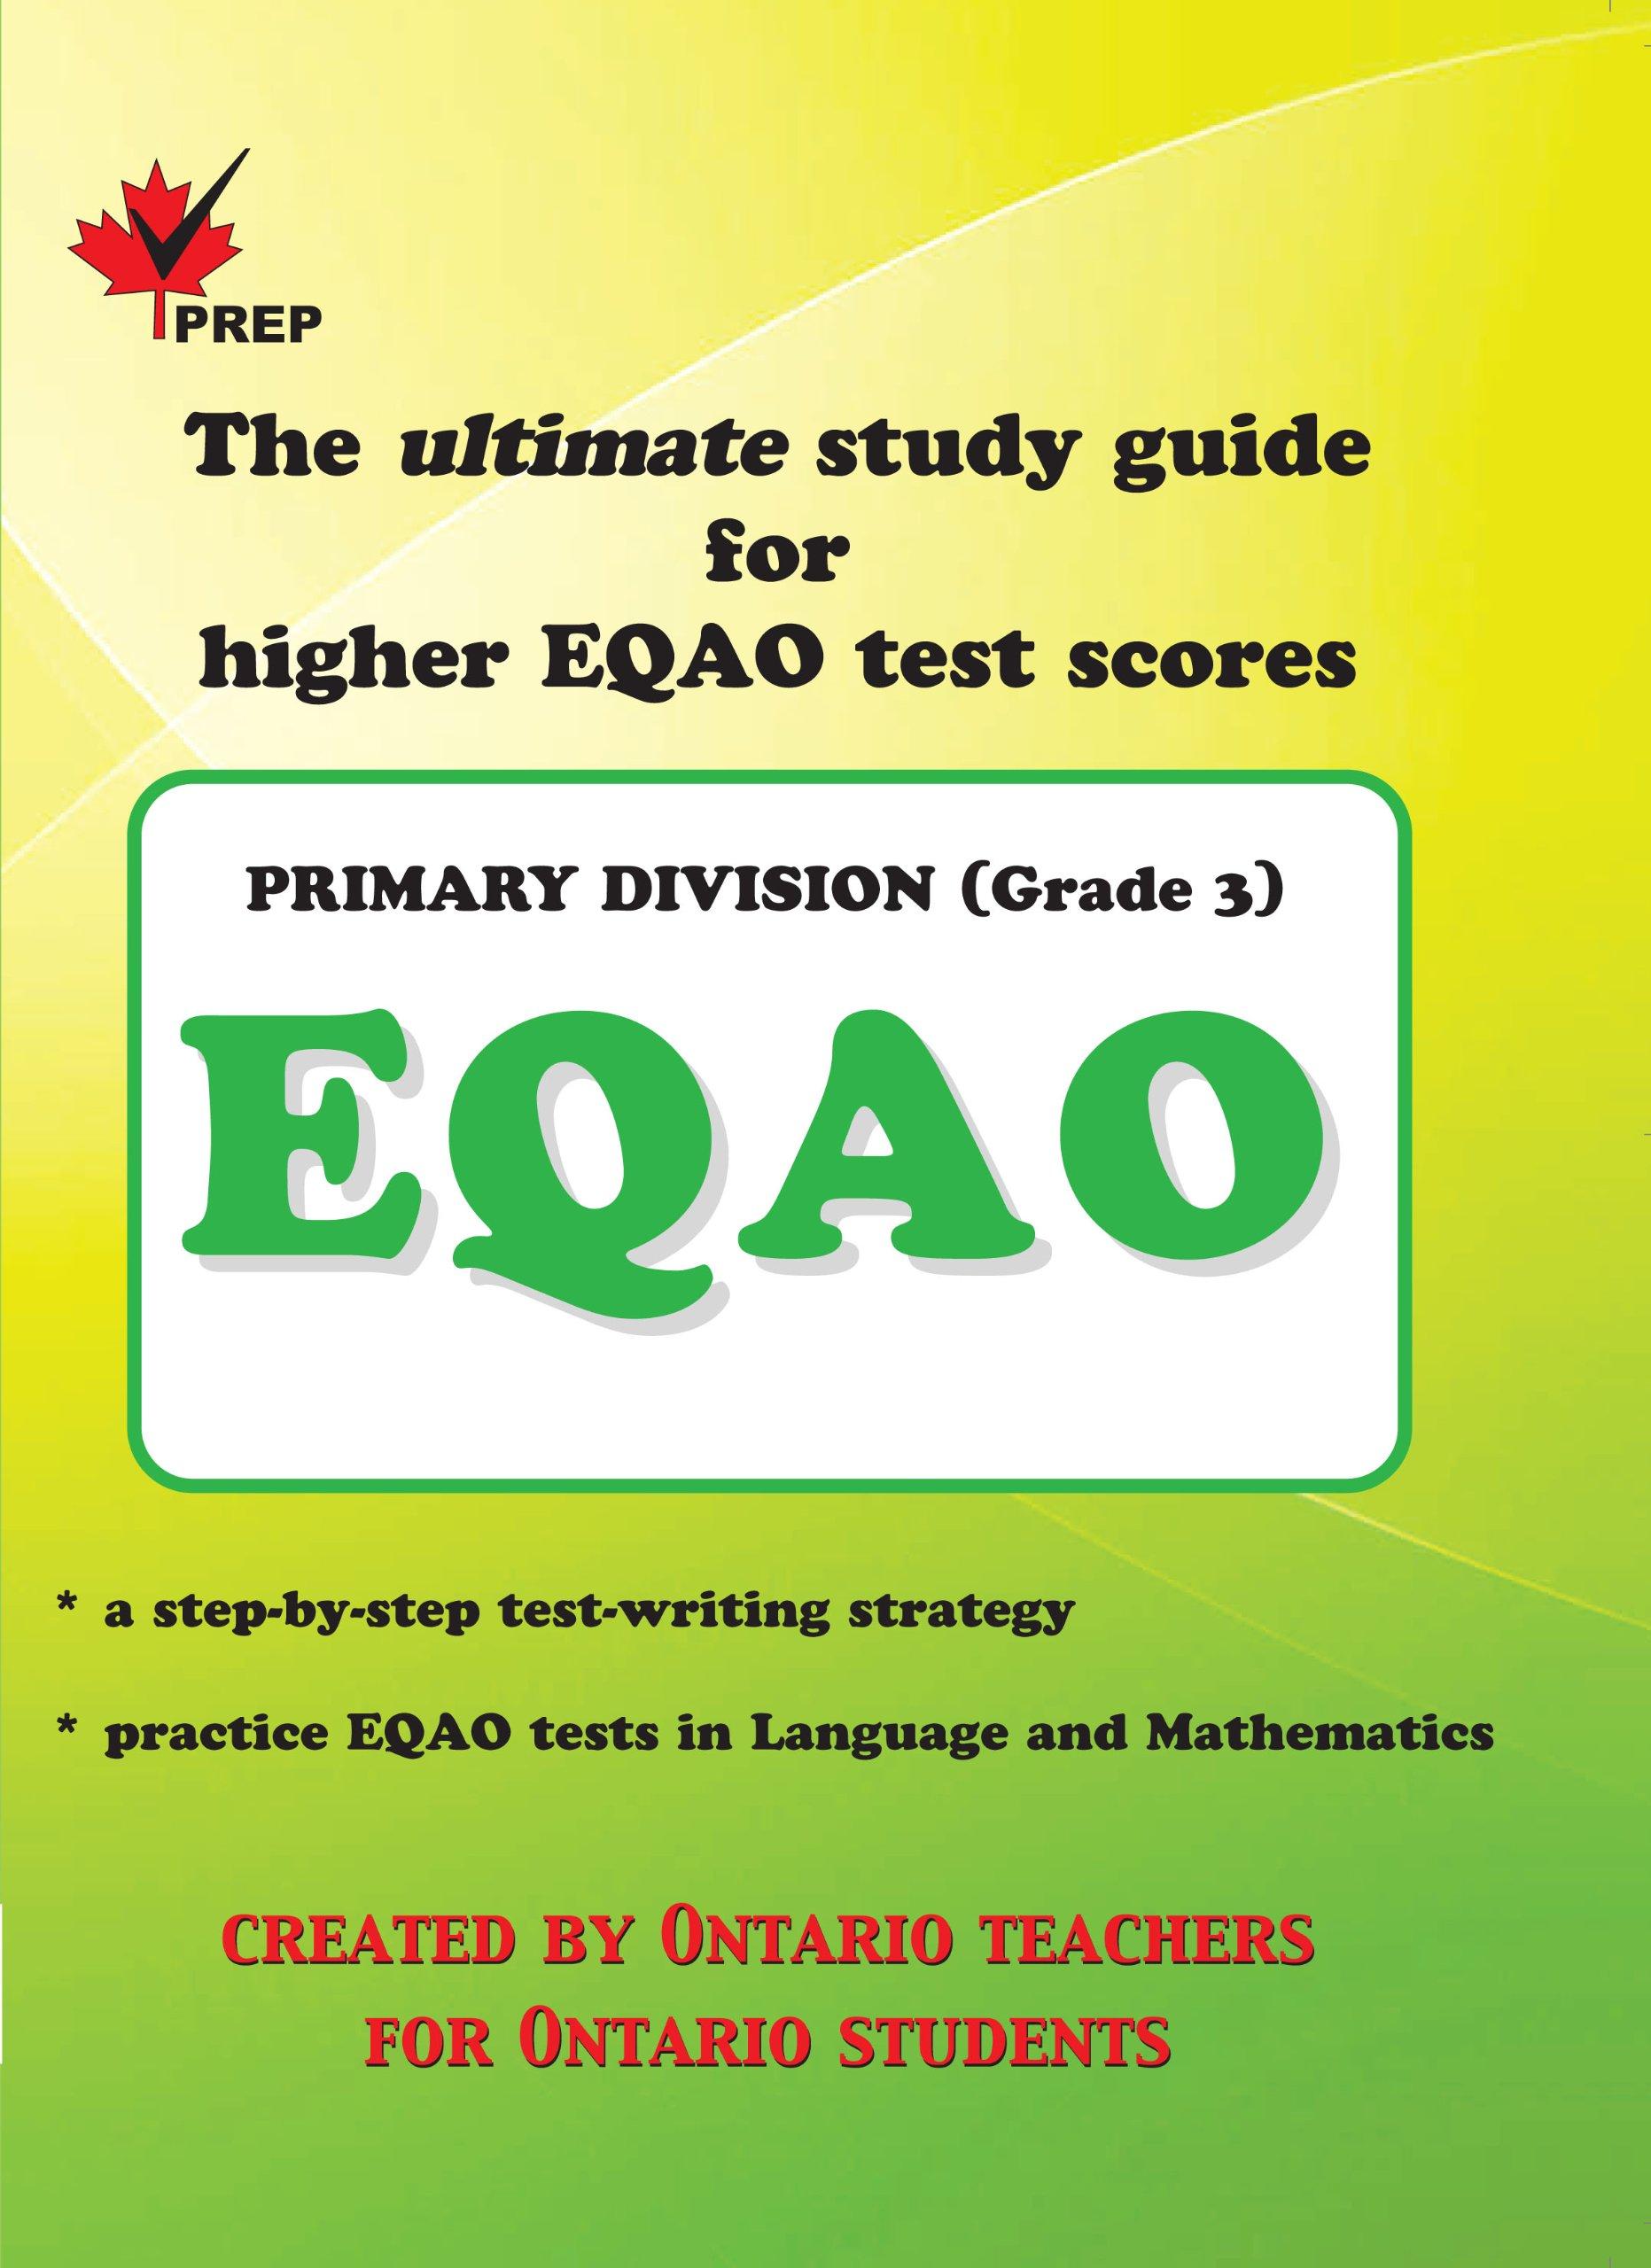 Grade 3 Eqao Summer Advantage Dr D Mullin 9781897440124 Books